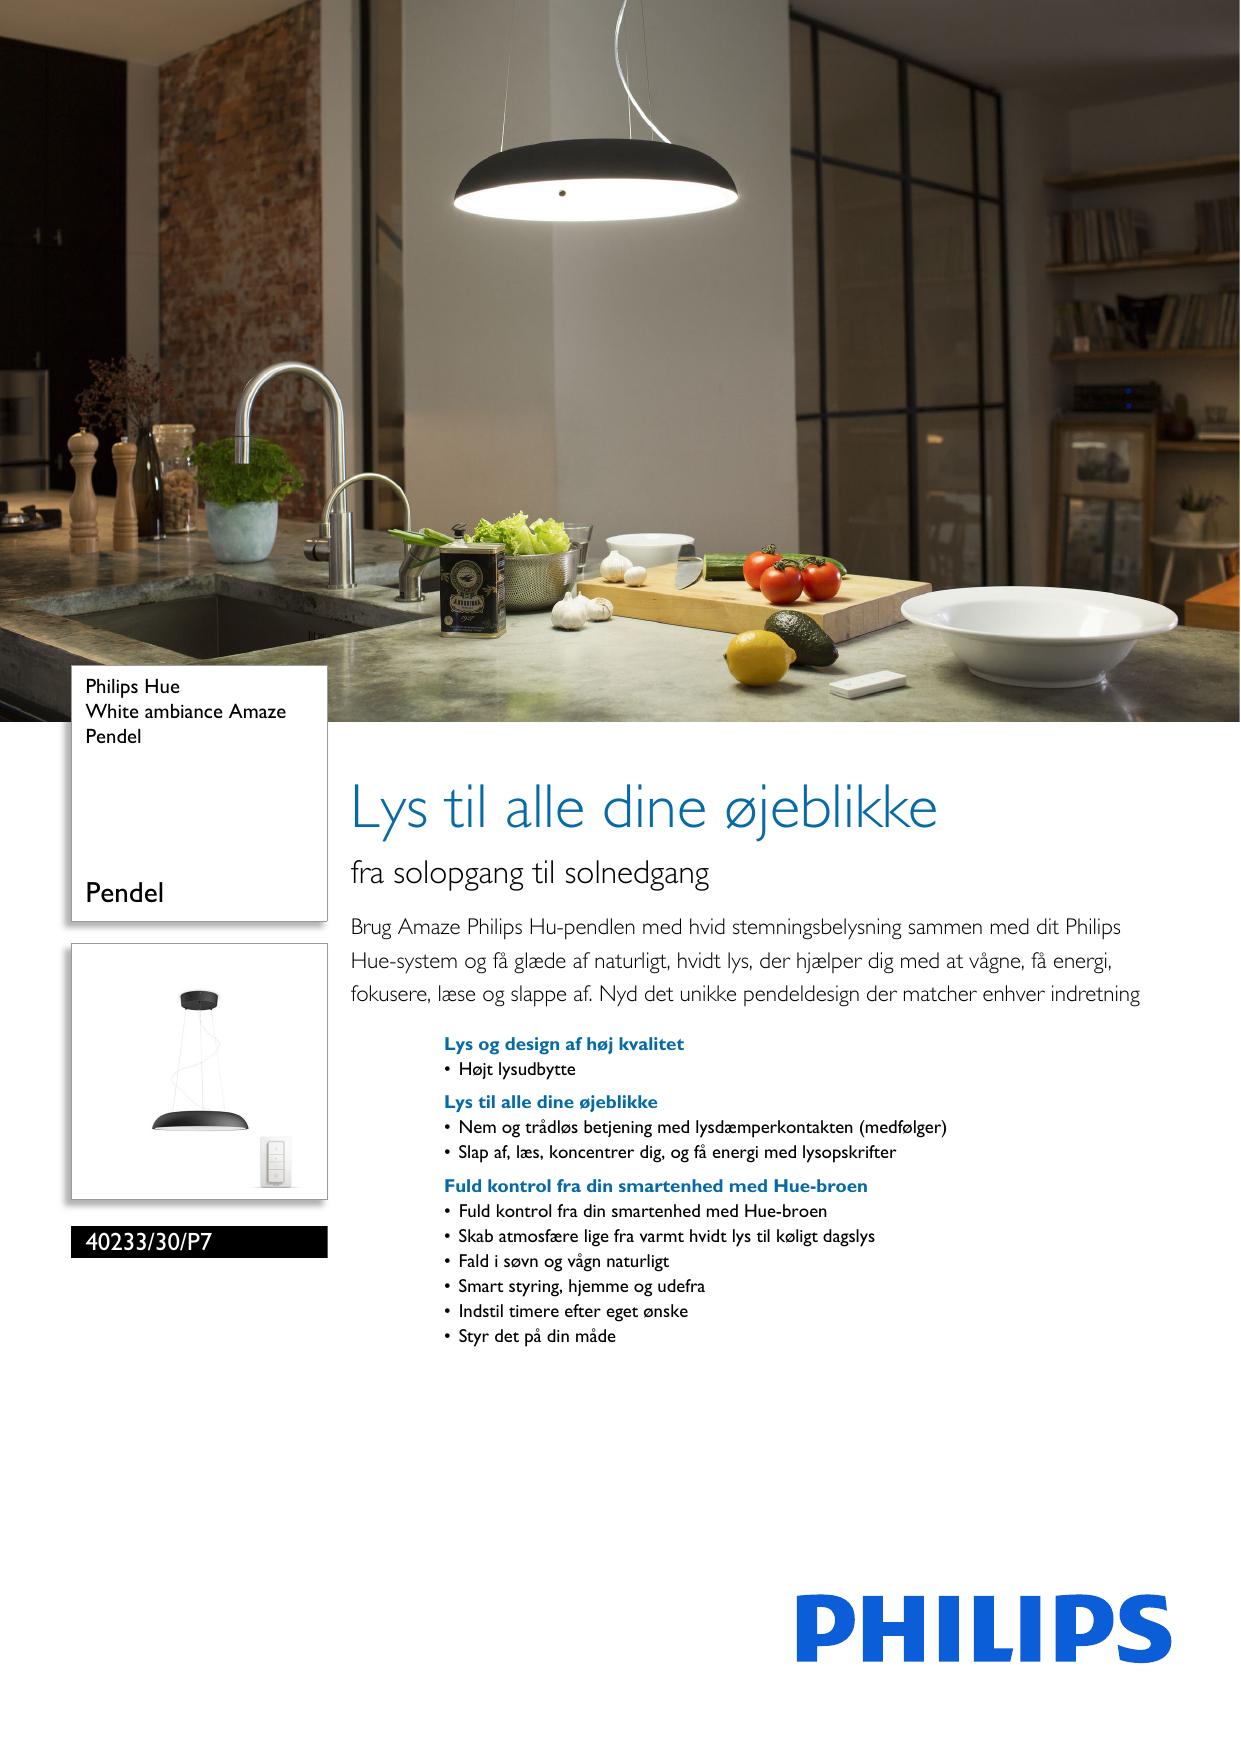 046adbe5ef2 Philips 40233/30/P7 4023330P7 White Ambiance Amaze Pendel User Manual Pss  Dandk